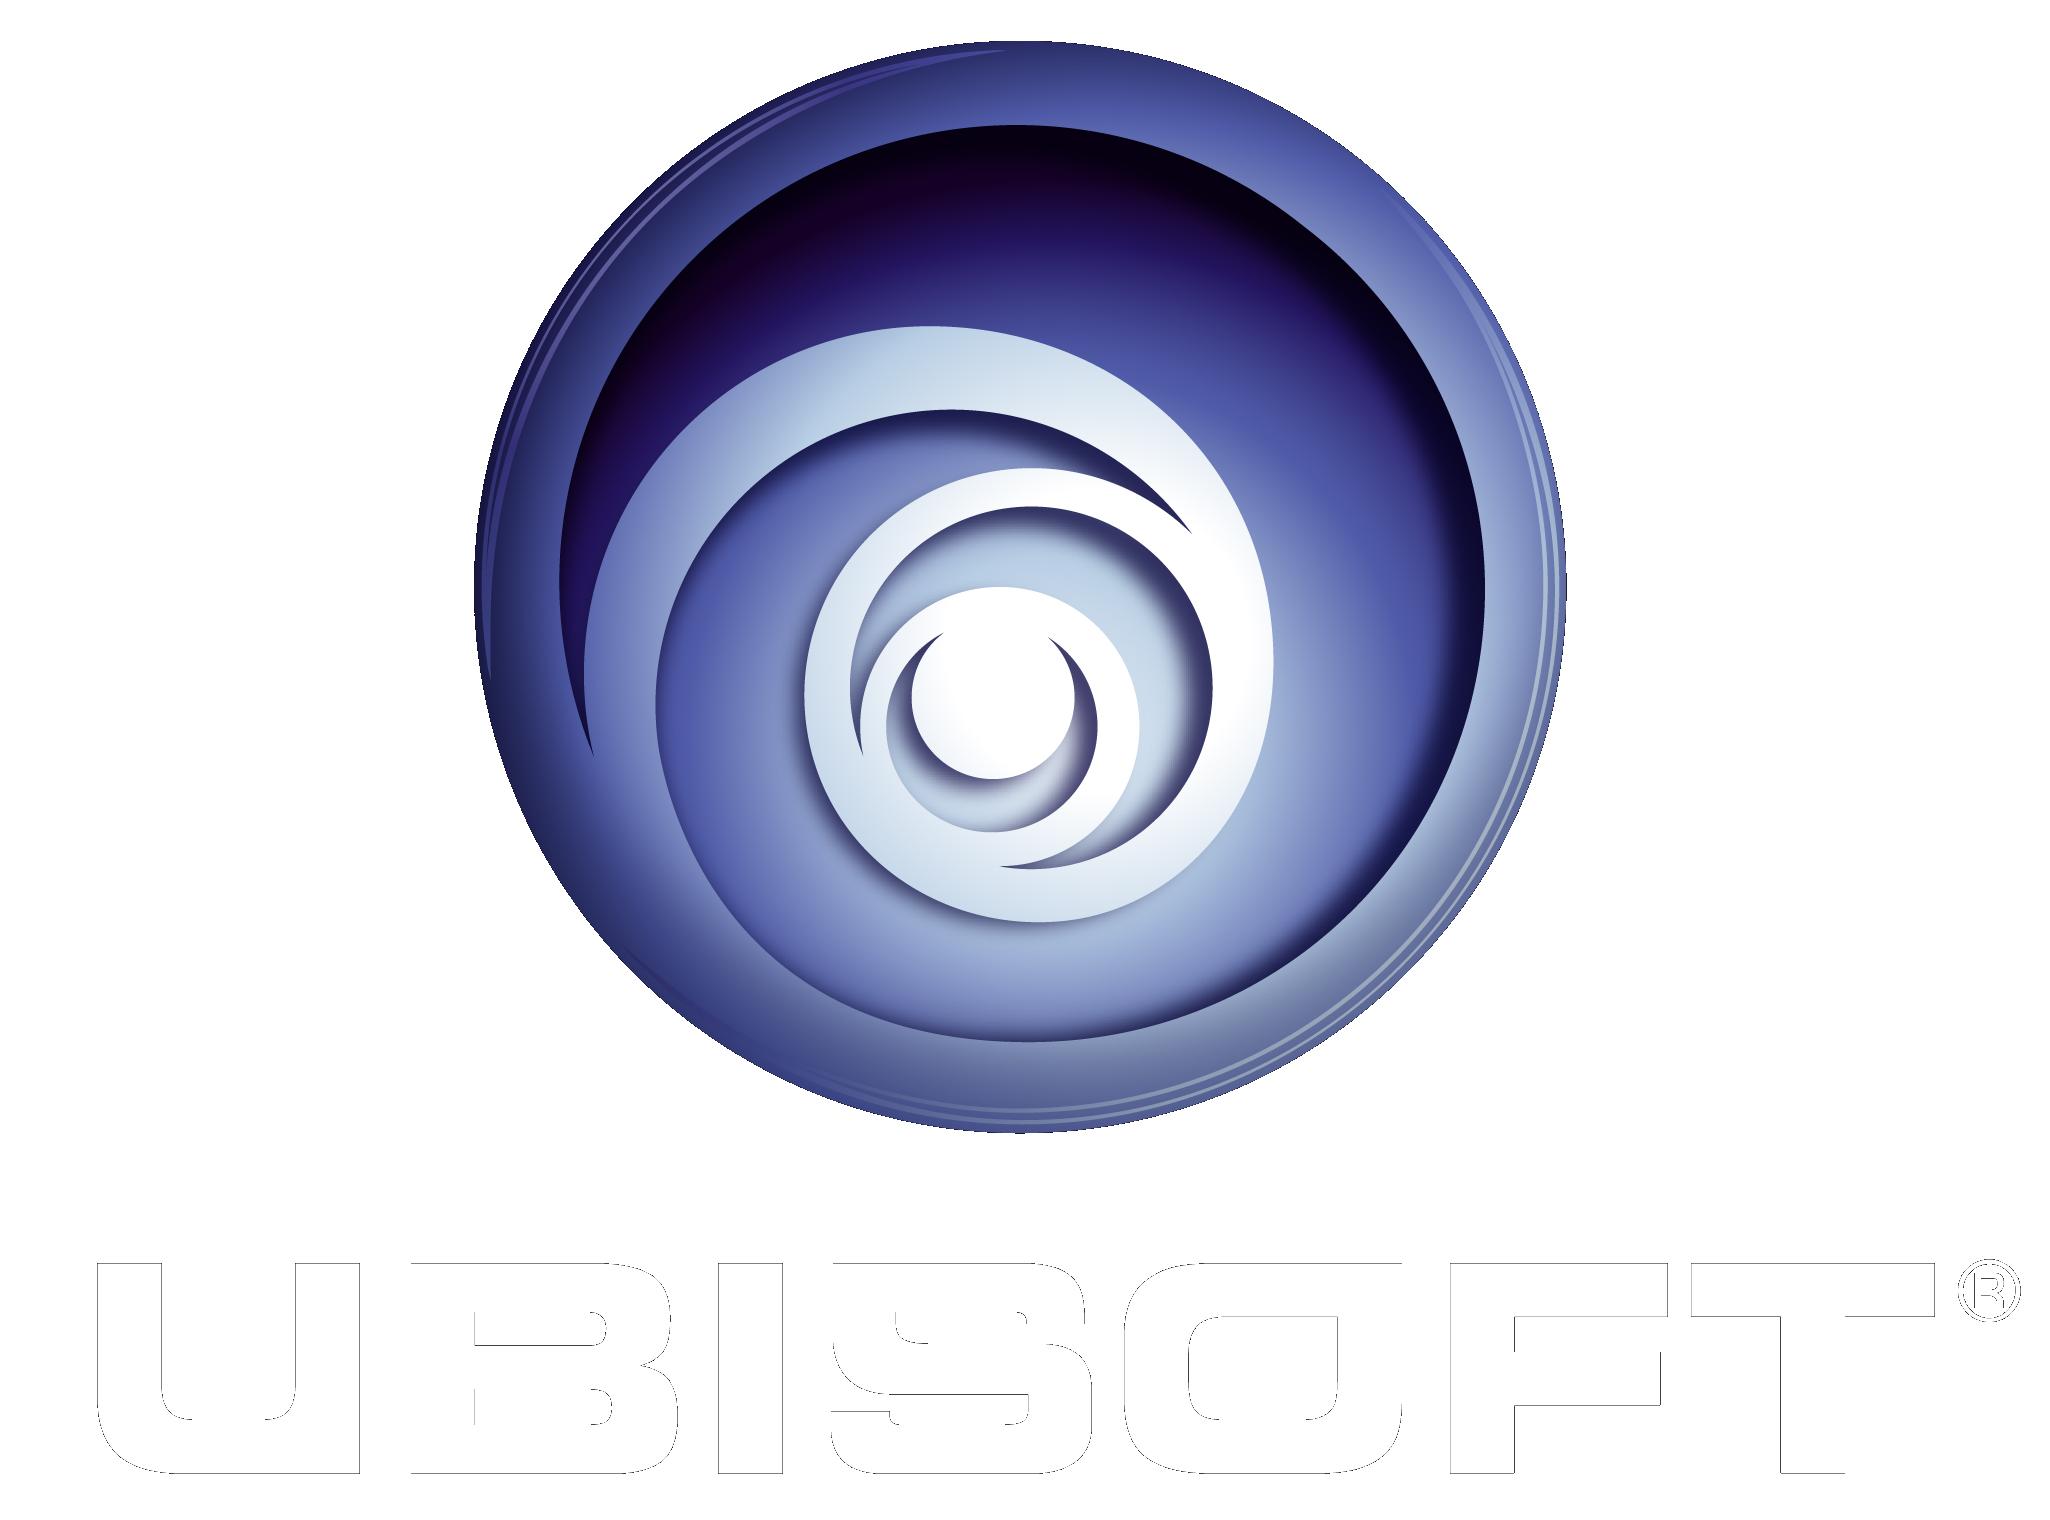 Ubisoft Montreal Chose...